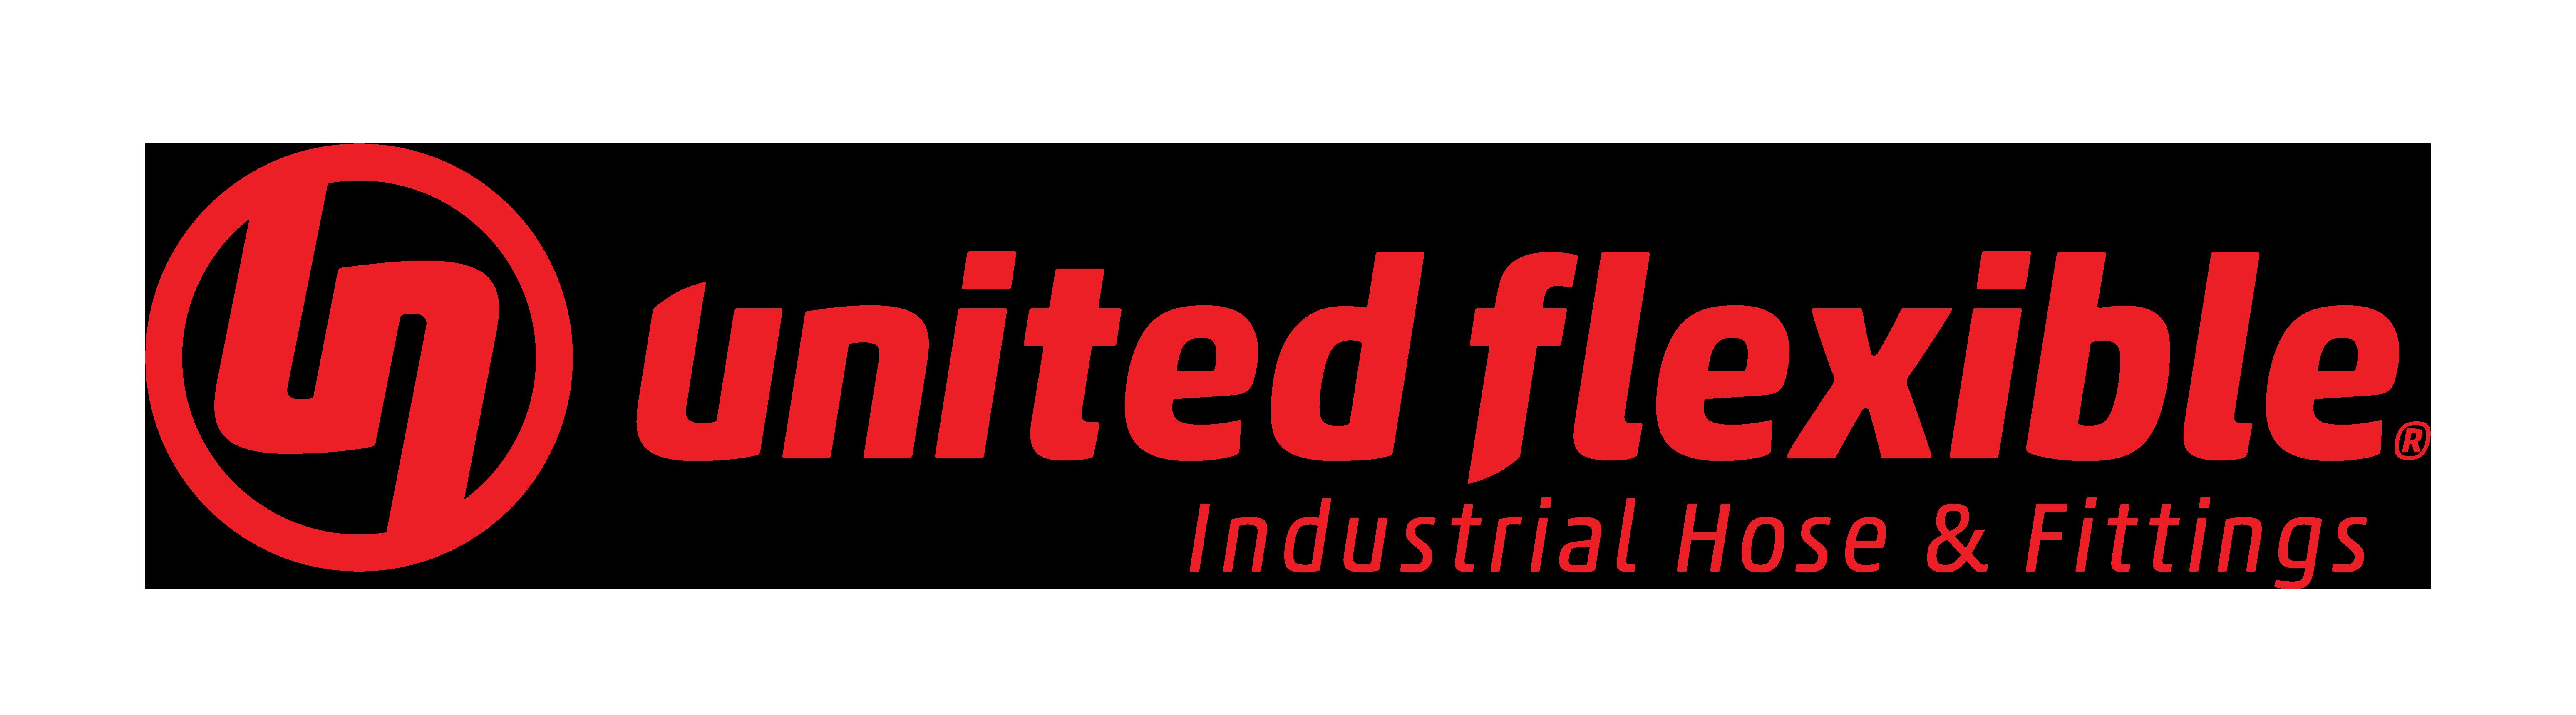 United Flexible